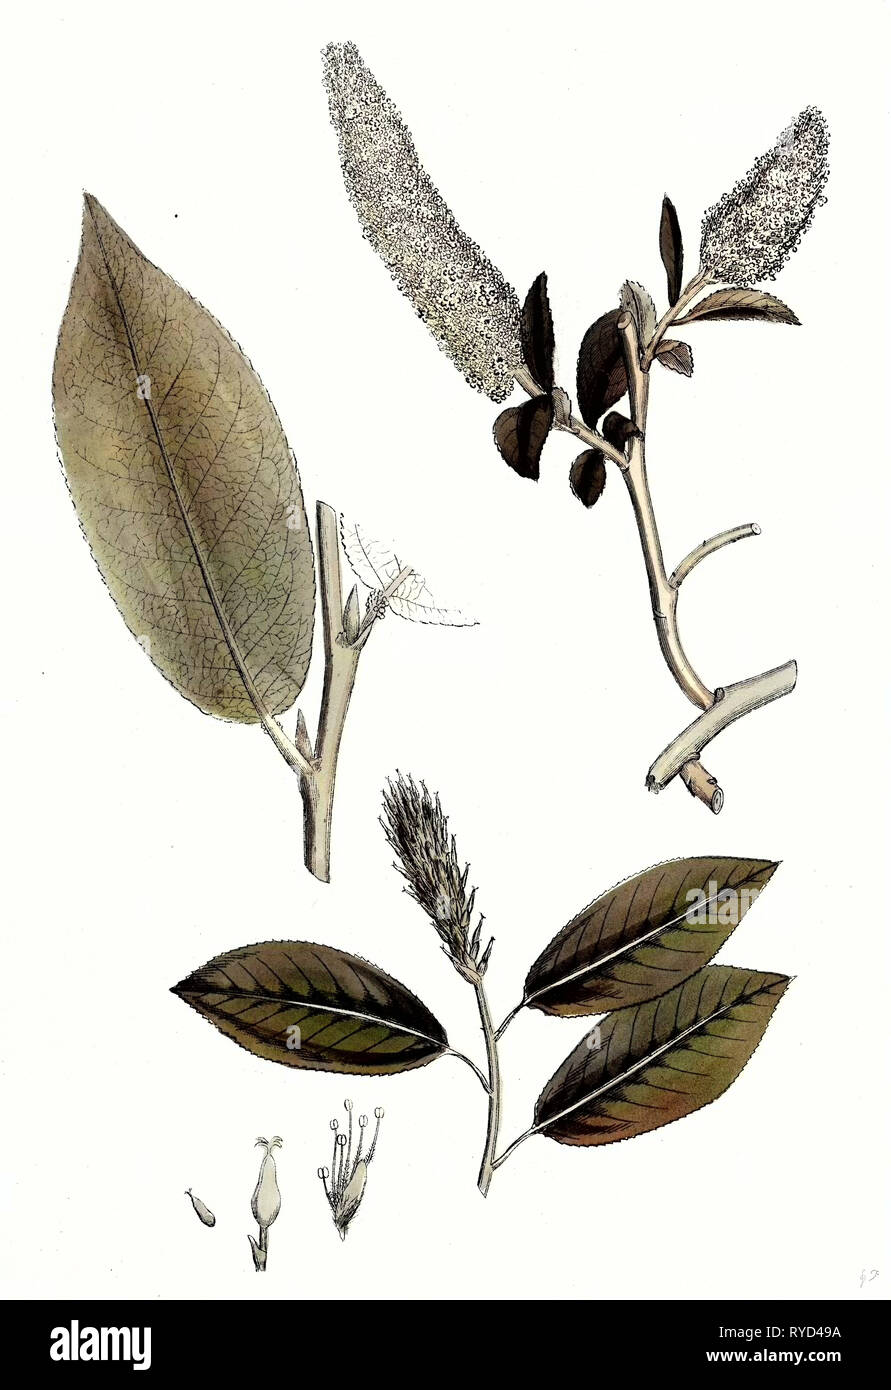 Salix Pentandra Bay-Leaved Willow - Stock Image